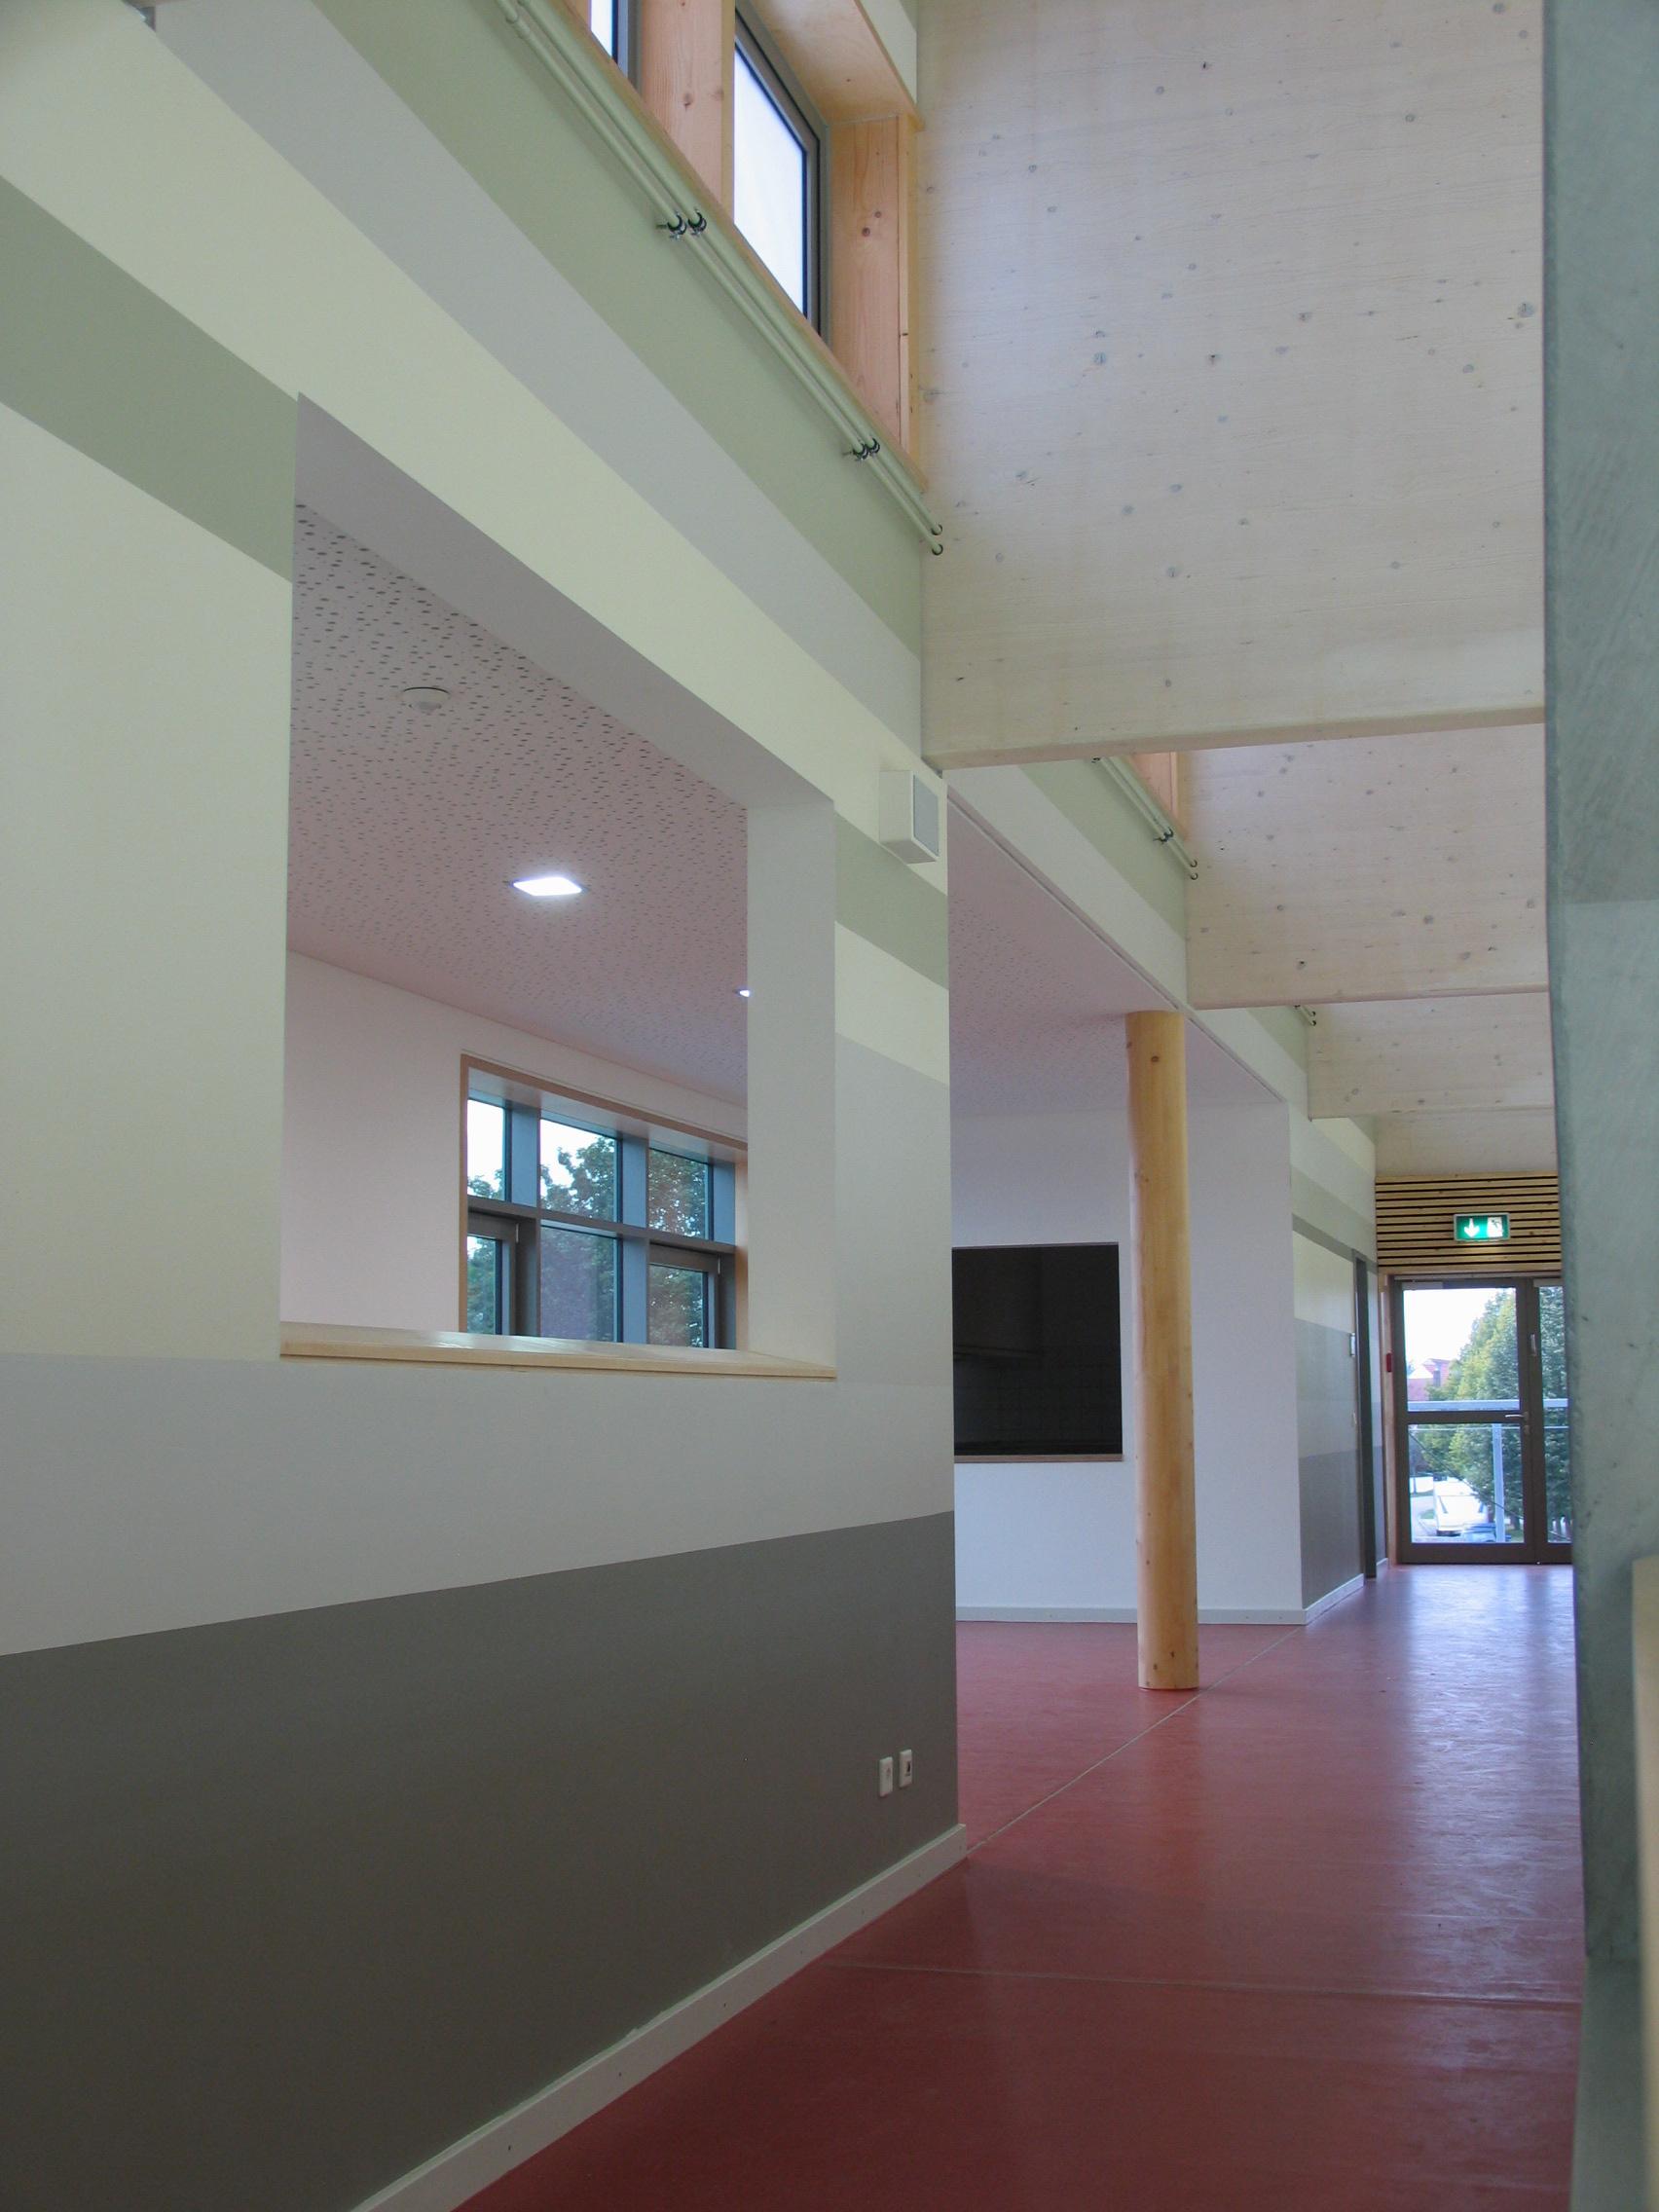 3-fach Sporthalle Manching Farbgestaltung